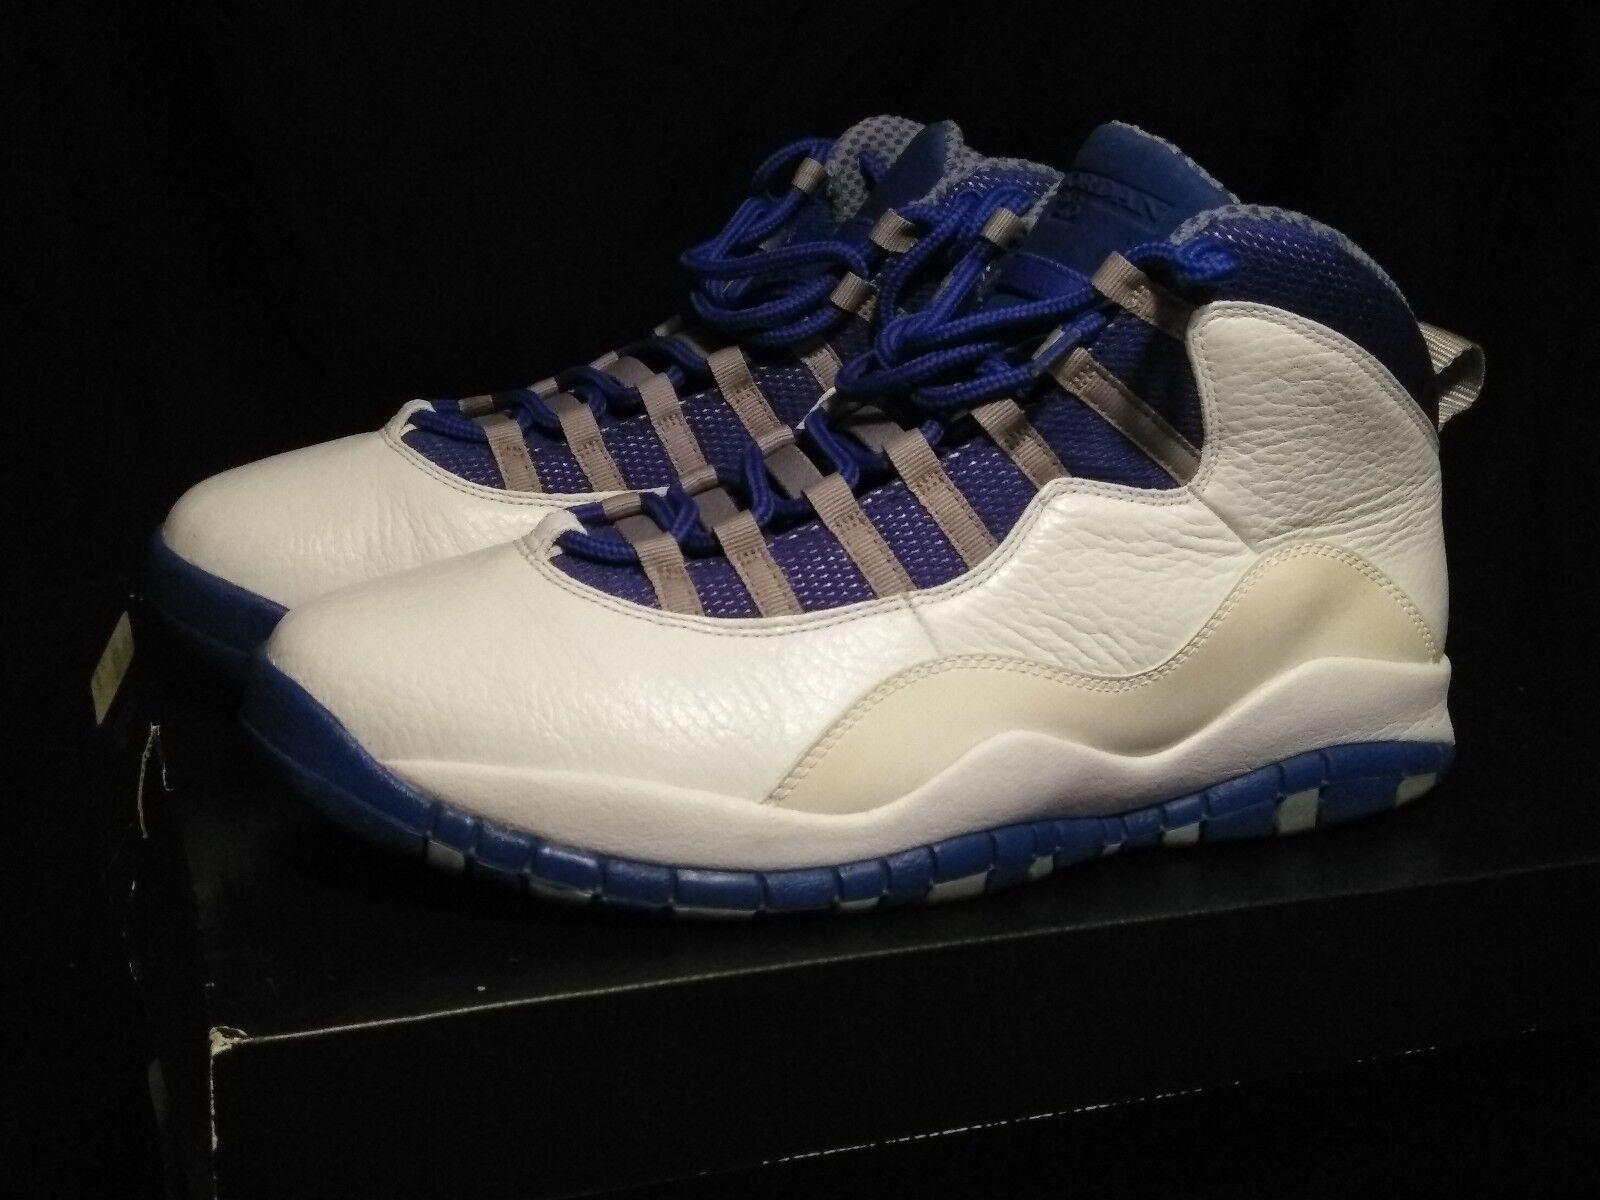 5c1a7cf7ffb Mens air Jordan retro 10 royal bluee used 11.5 100% authentic 90 ...